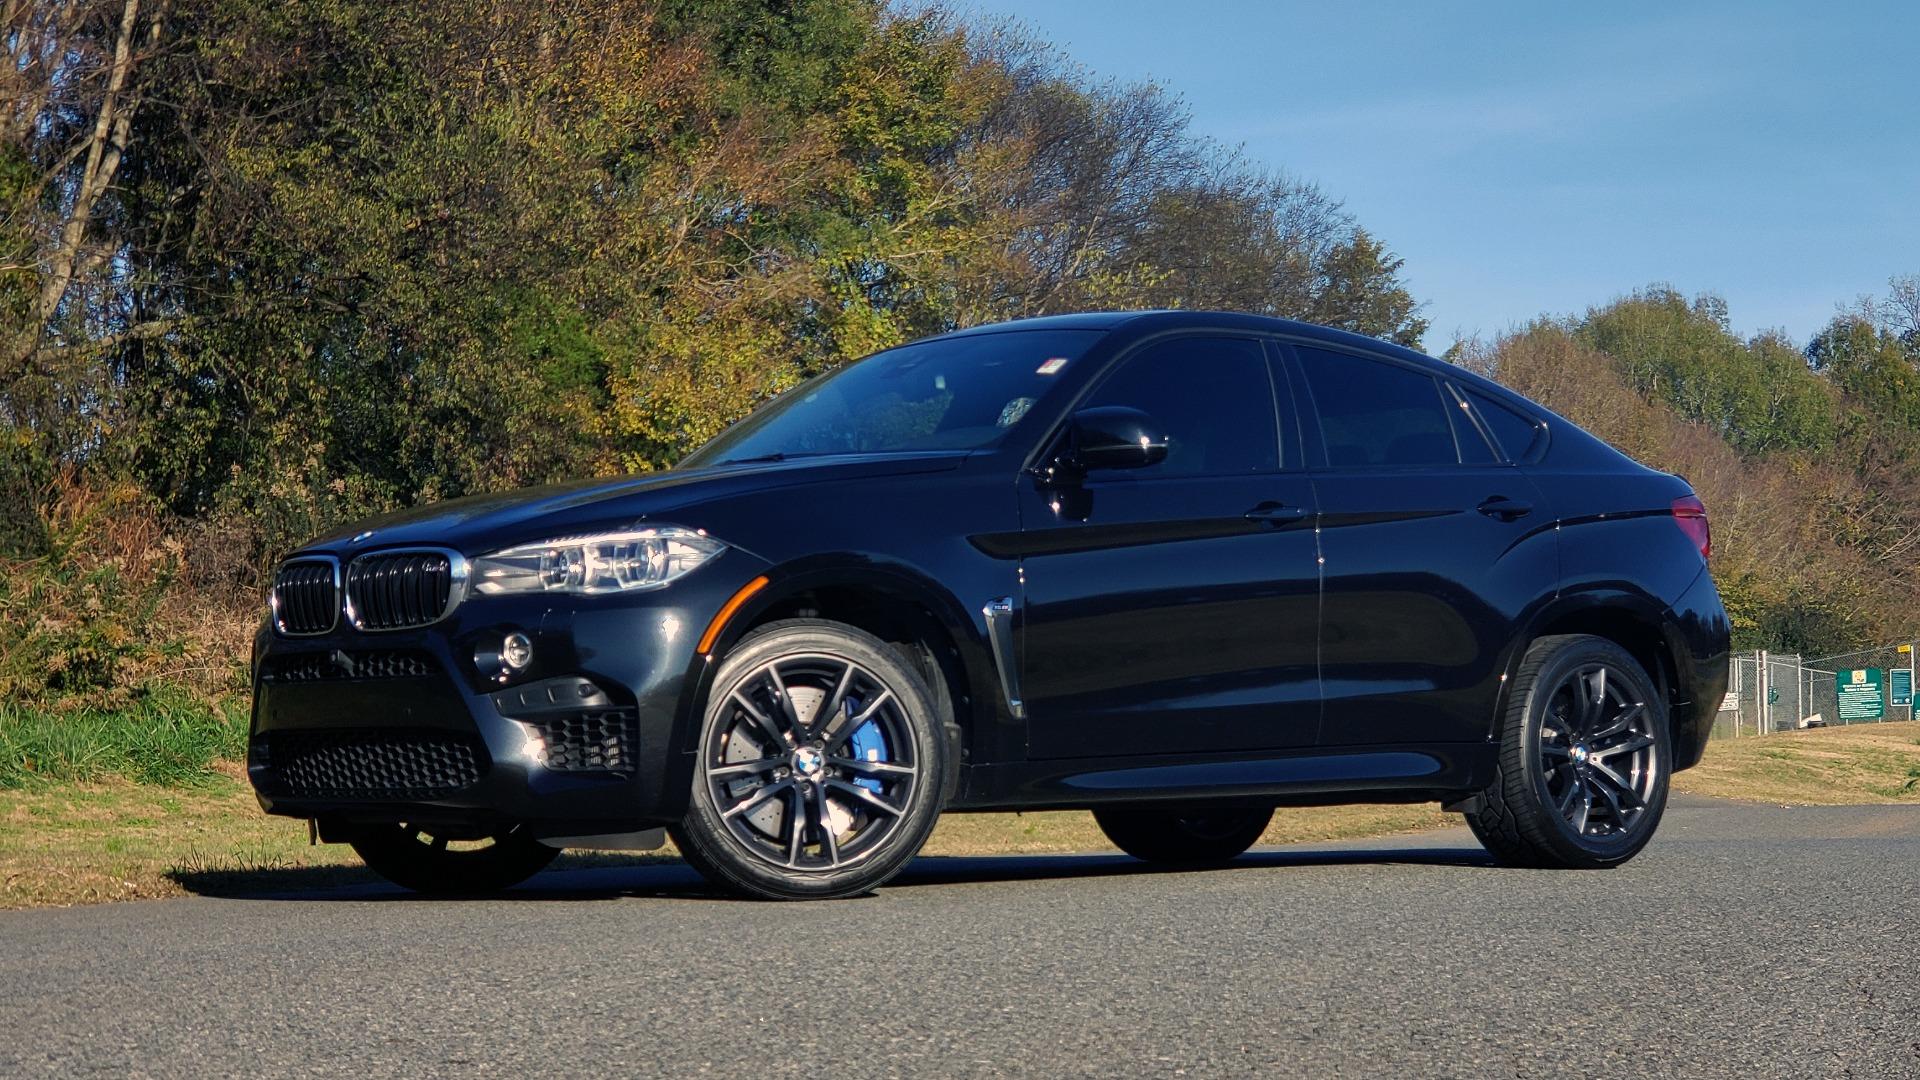 Used 2016 BMW X6 M EXEC PKG / DRVR ASST / NAV / SUNROOF / BLIND SPOT / REARVIEW for sale Sold at Formula Imports in Charlotte NC 28227 84